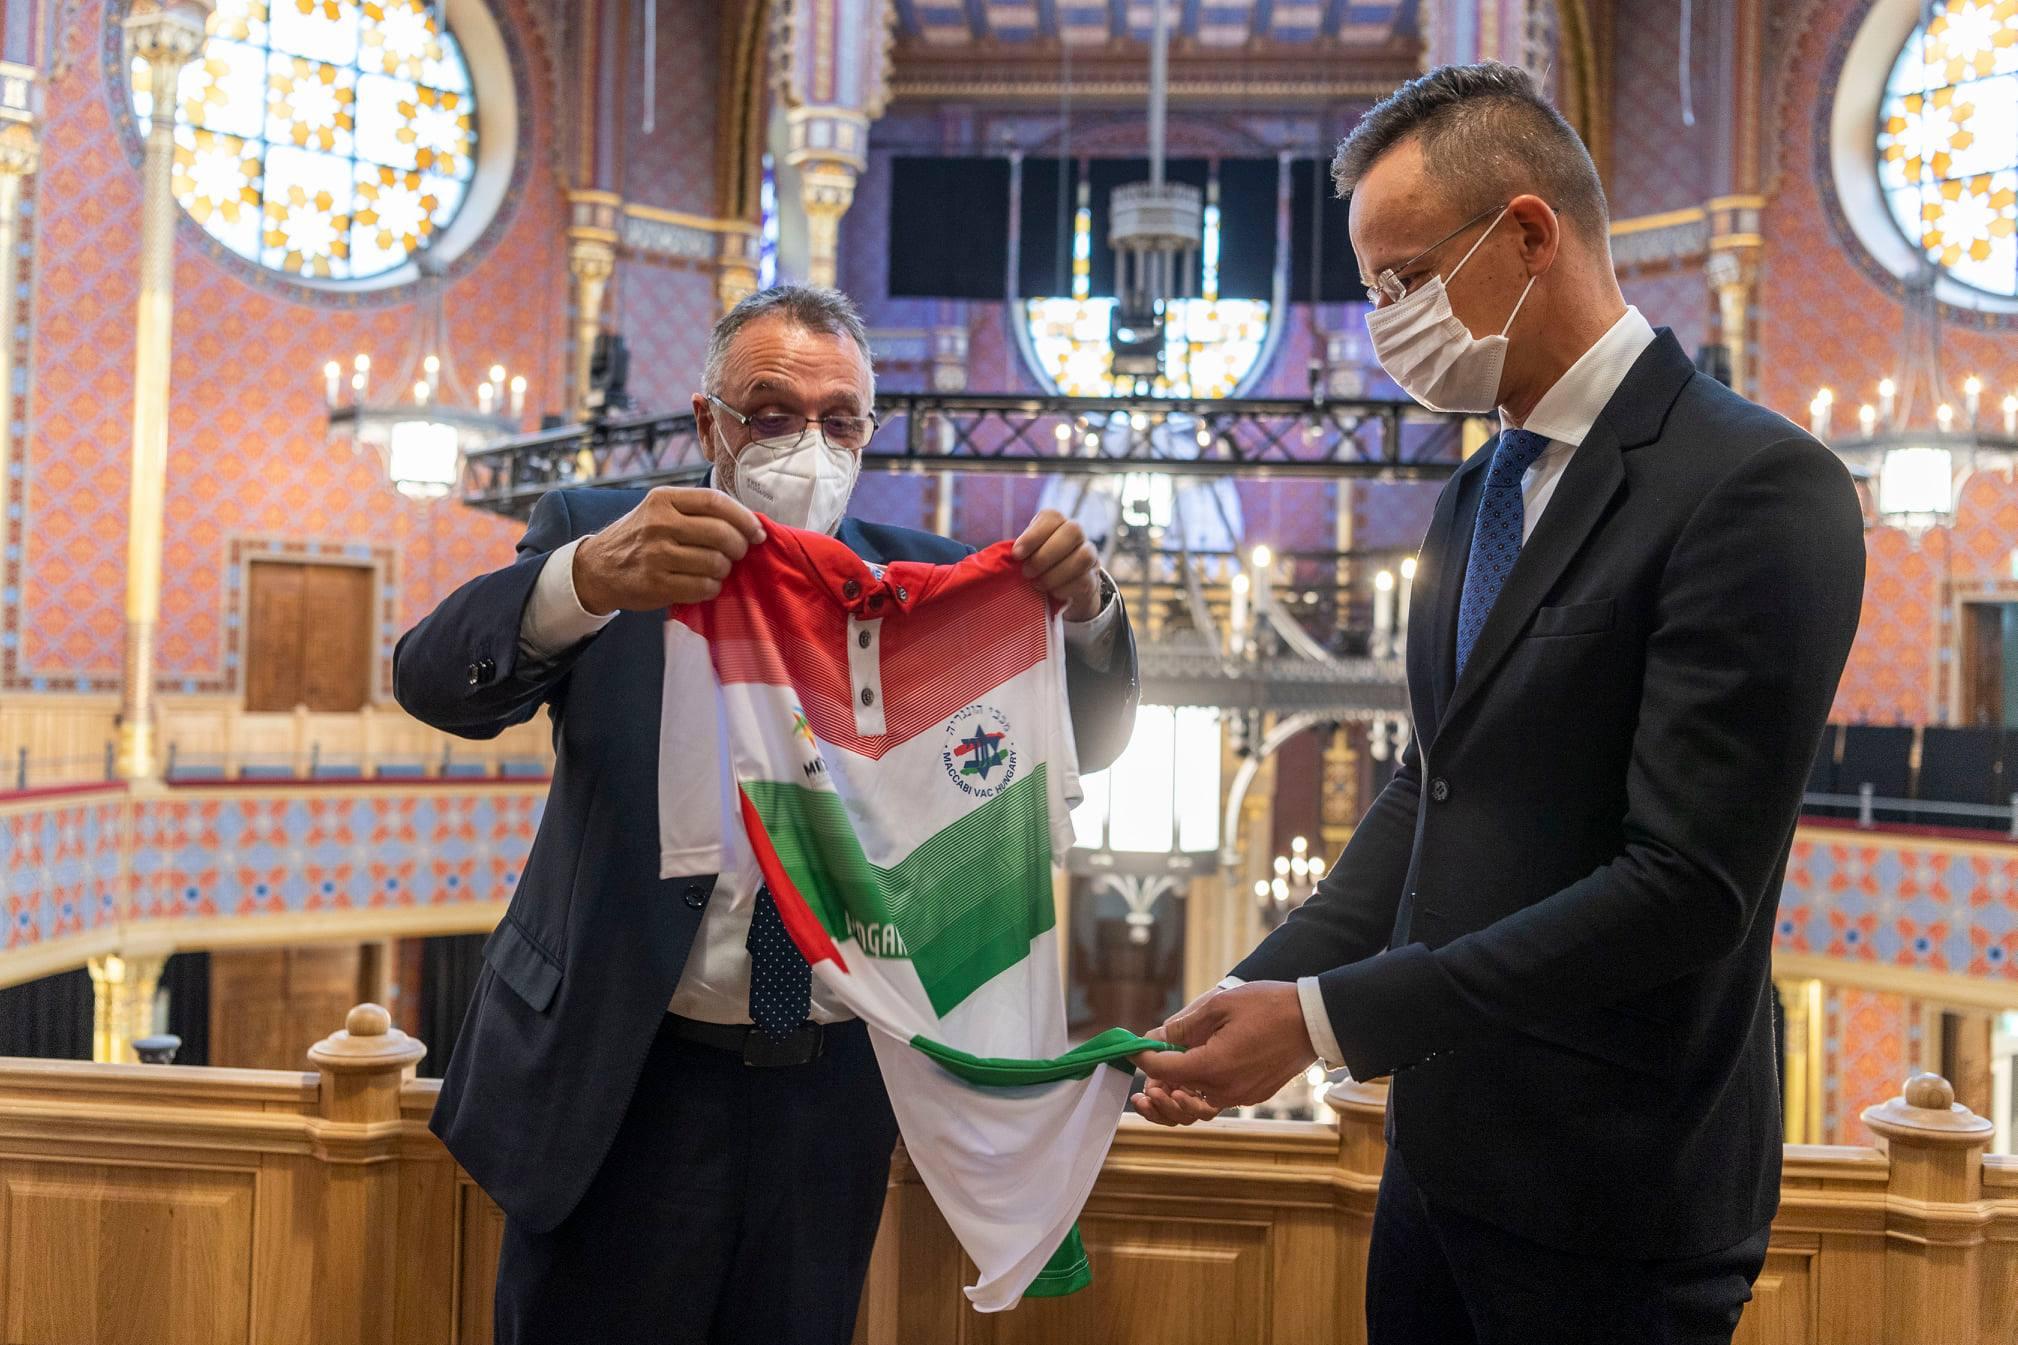 FM Szijjártó Meets Mazsihisz Leader: Constructive Dialogue with Jewish Organisations Important post's picture